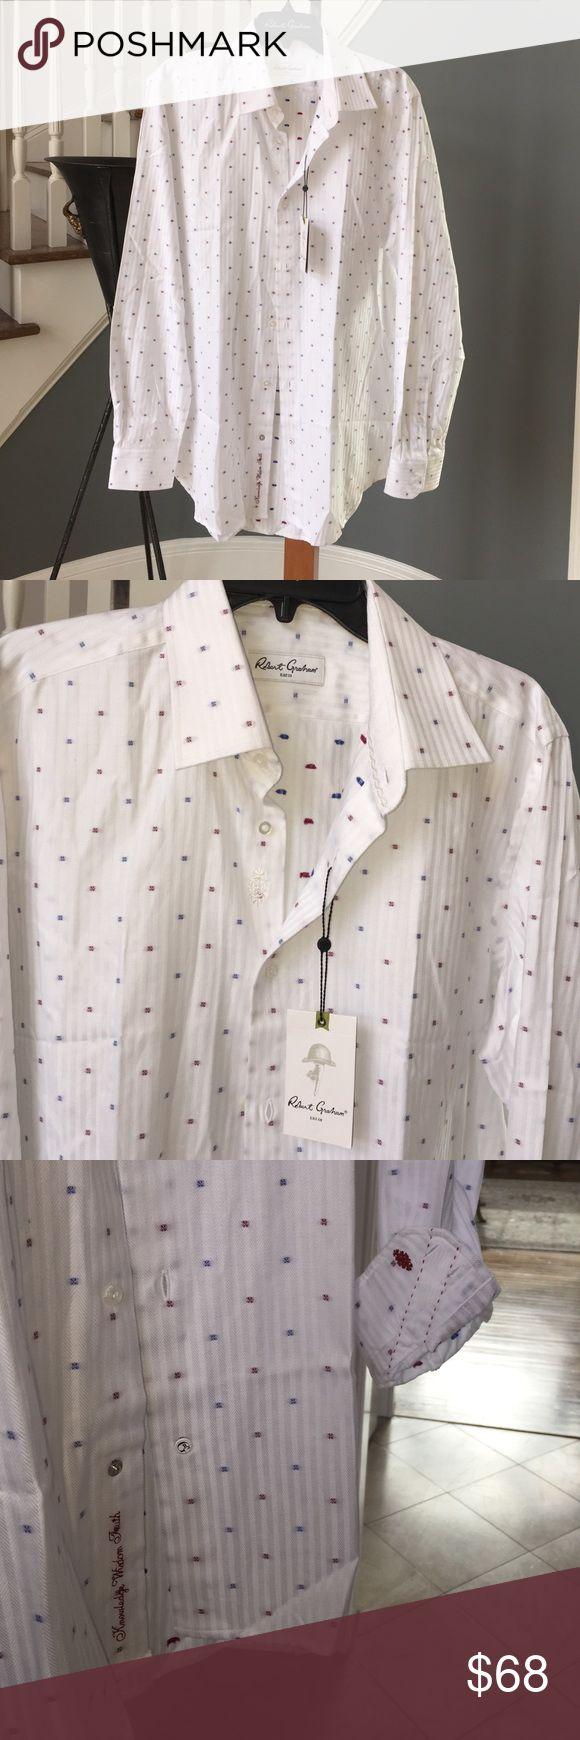 Robert Graham / Style: Isaac RC in white Robert Graham sleek white shirt with Robert Graham logo on cuff.  100% Cotton sizes: 42 / US 16.5 Robert Graham Shirts